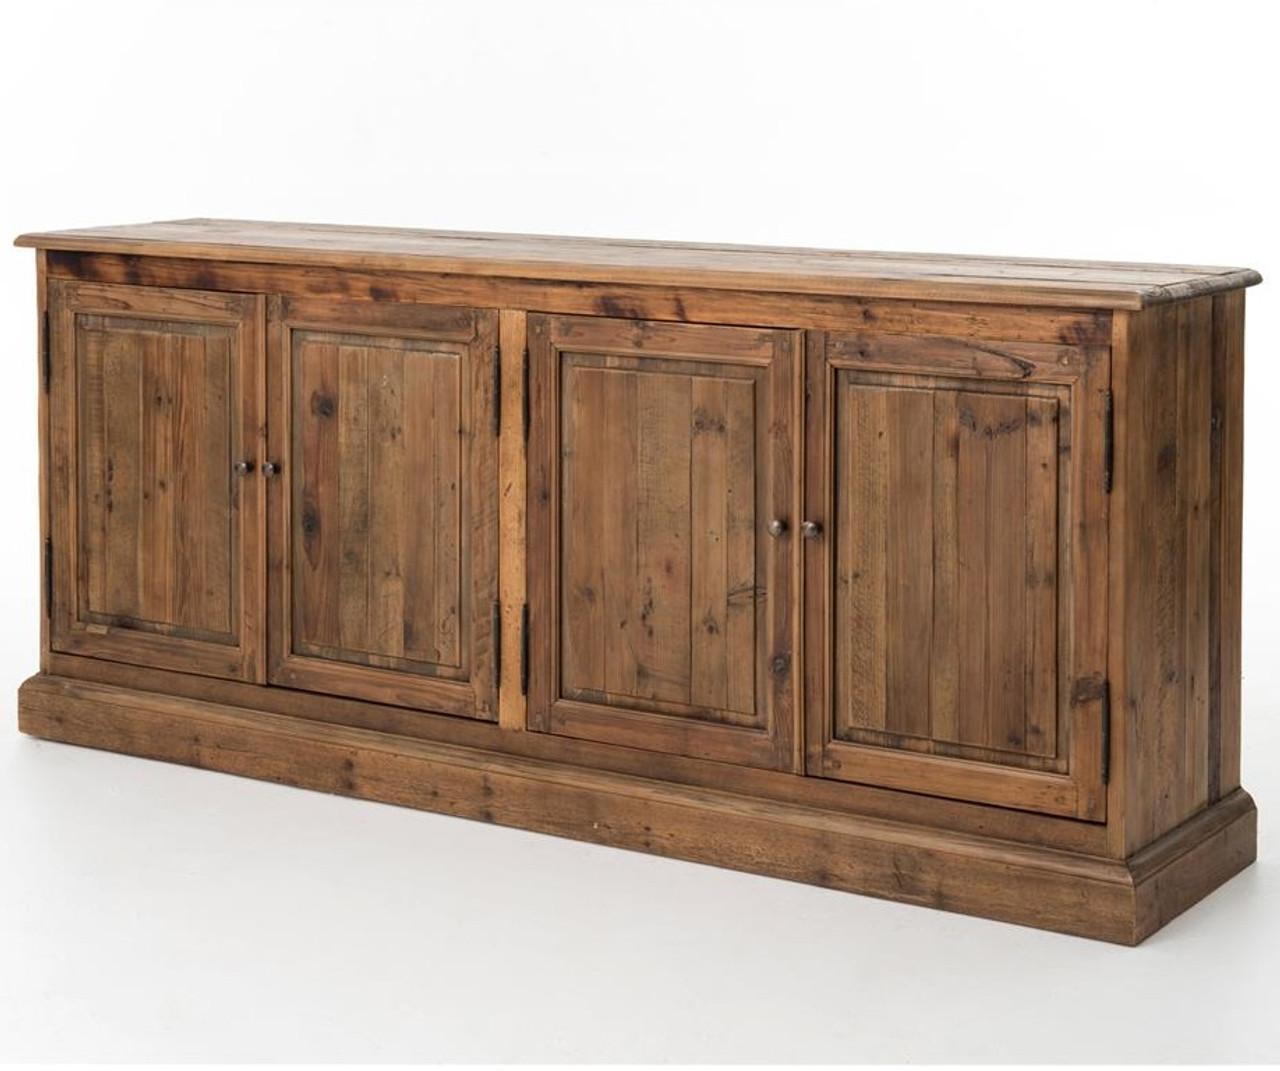 salvaged wood 4 door buffet sideboard 79 zin home rh zinhome com reclaimed wood buffet with french hardware reclaimed wood buffett